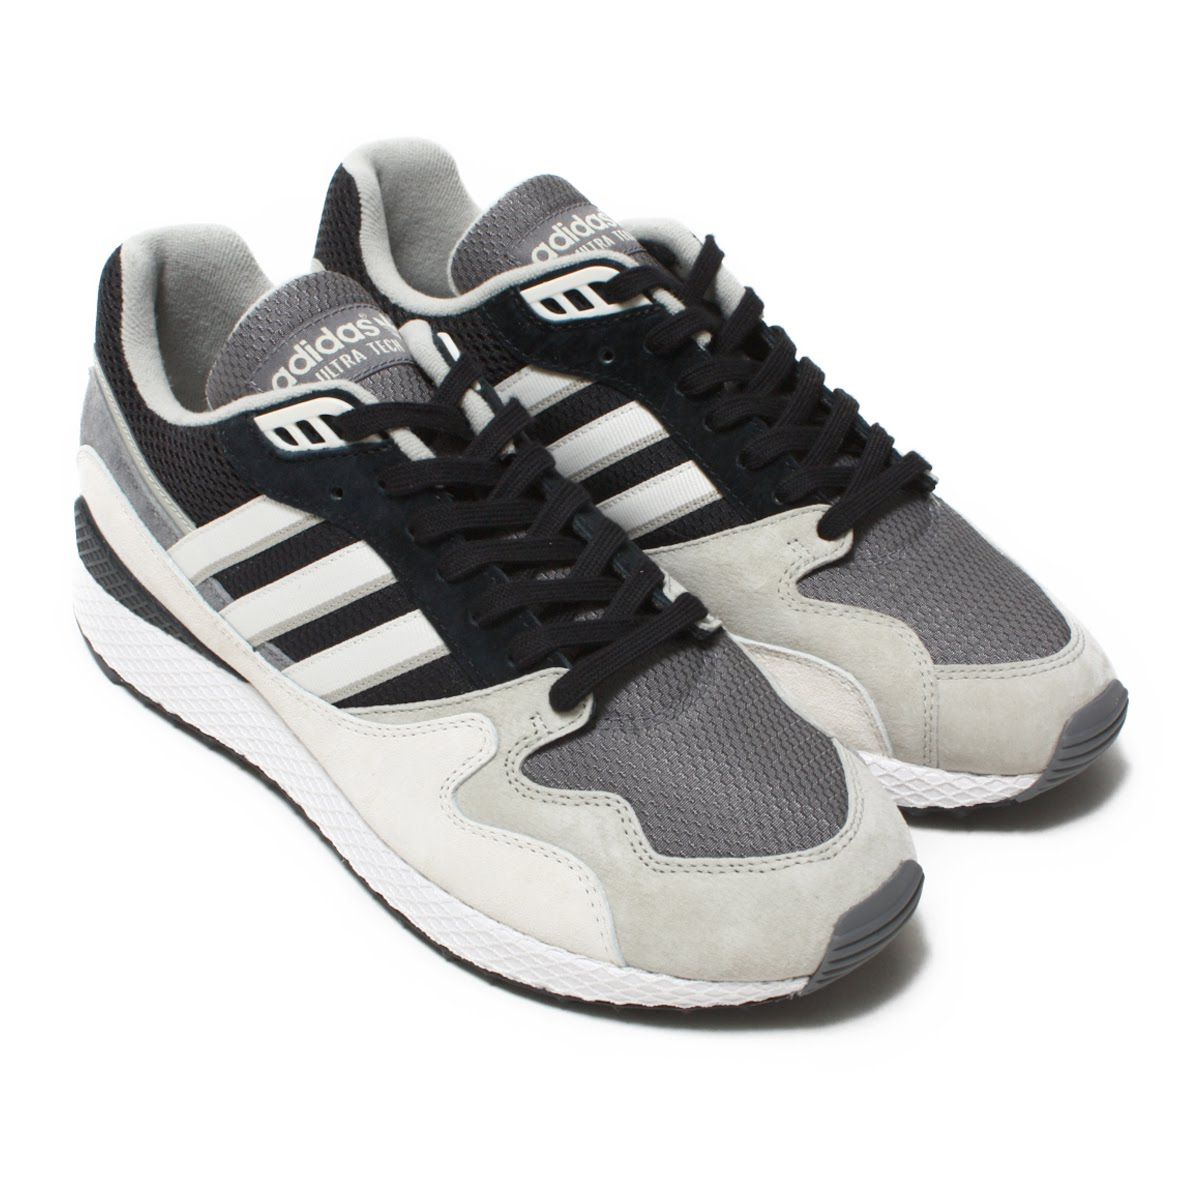 hot sale online fa068 75da0 adidas Originals ULTRA TECH (Adidas originals ultra technical center) CORE  BLACK CRYSTAL WHITE ...